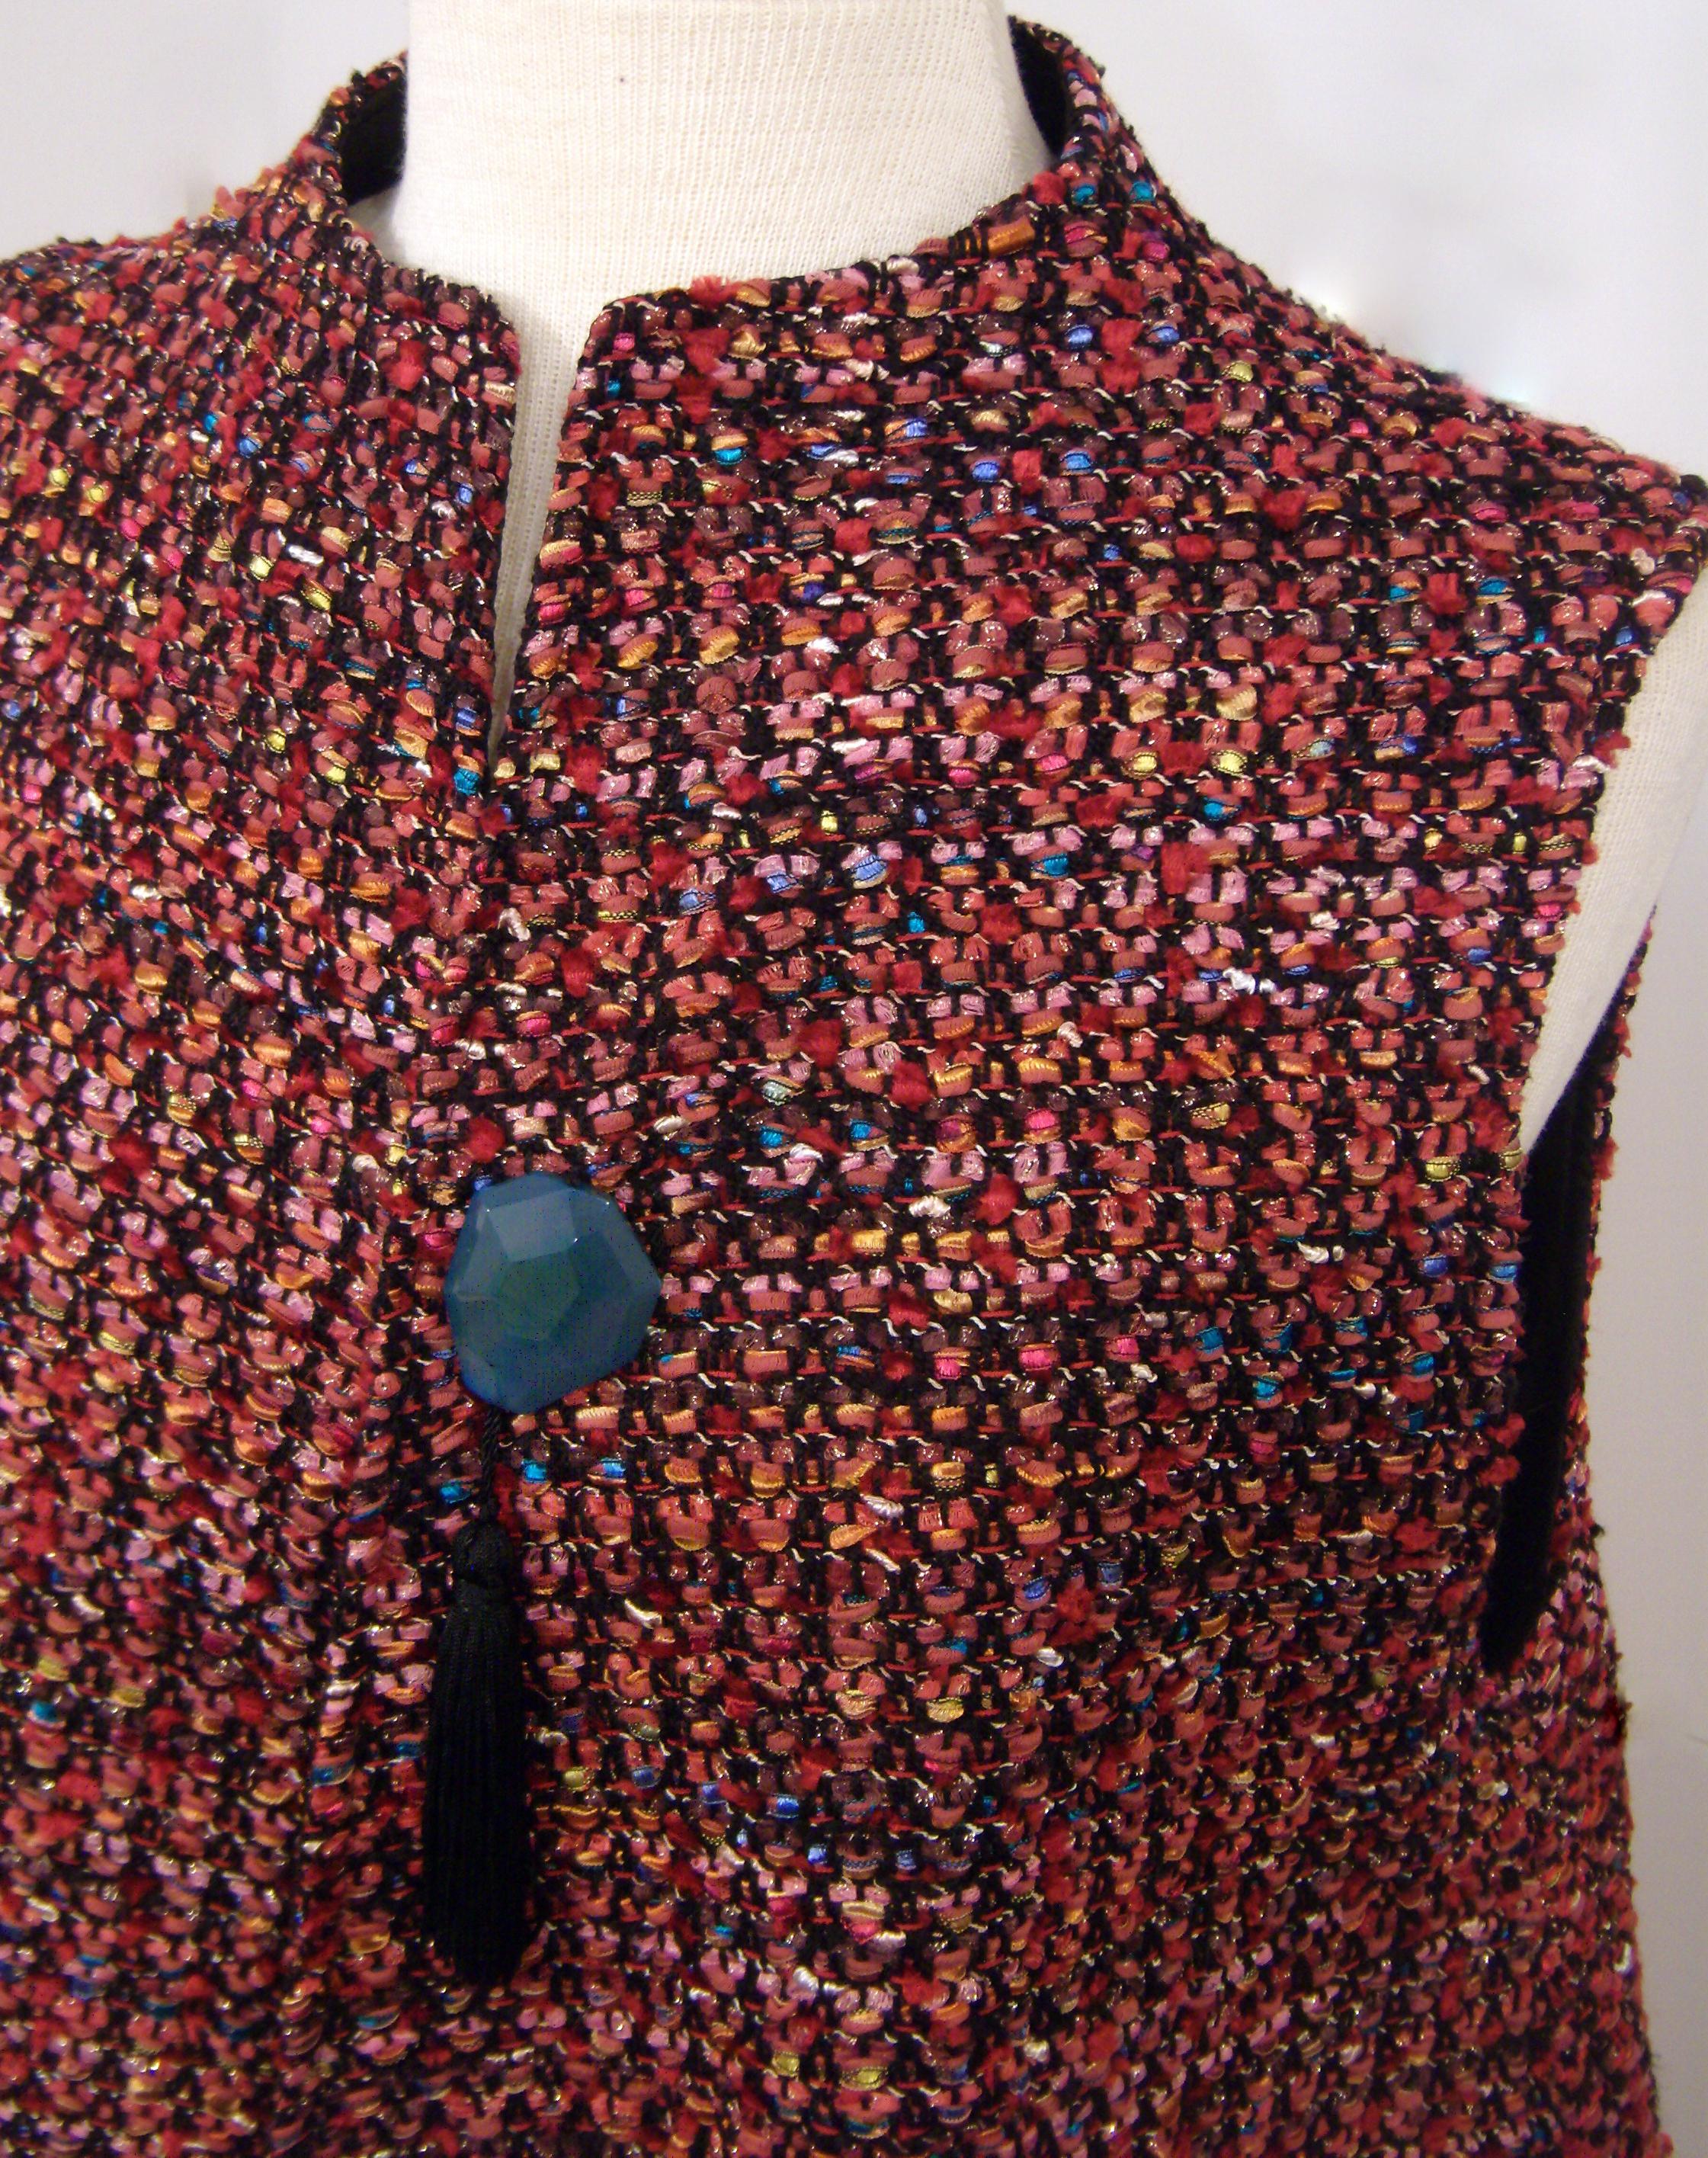 Handwoven Vest, Kathleen Weir-West, Business Clothing 4.JPG